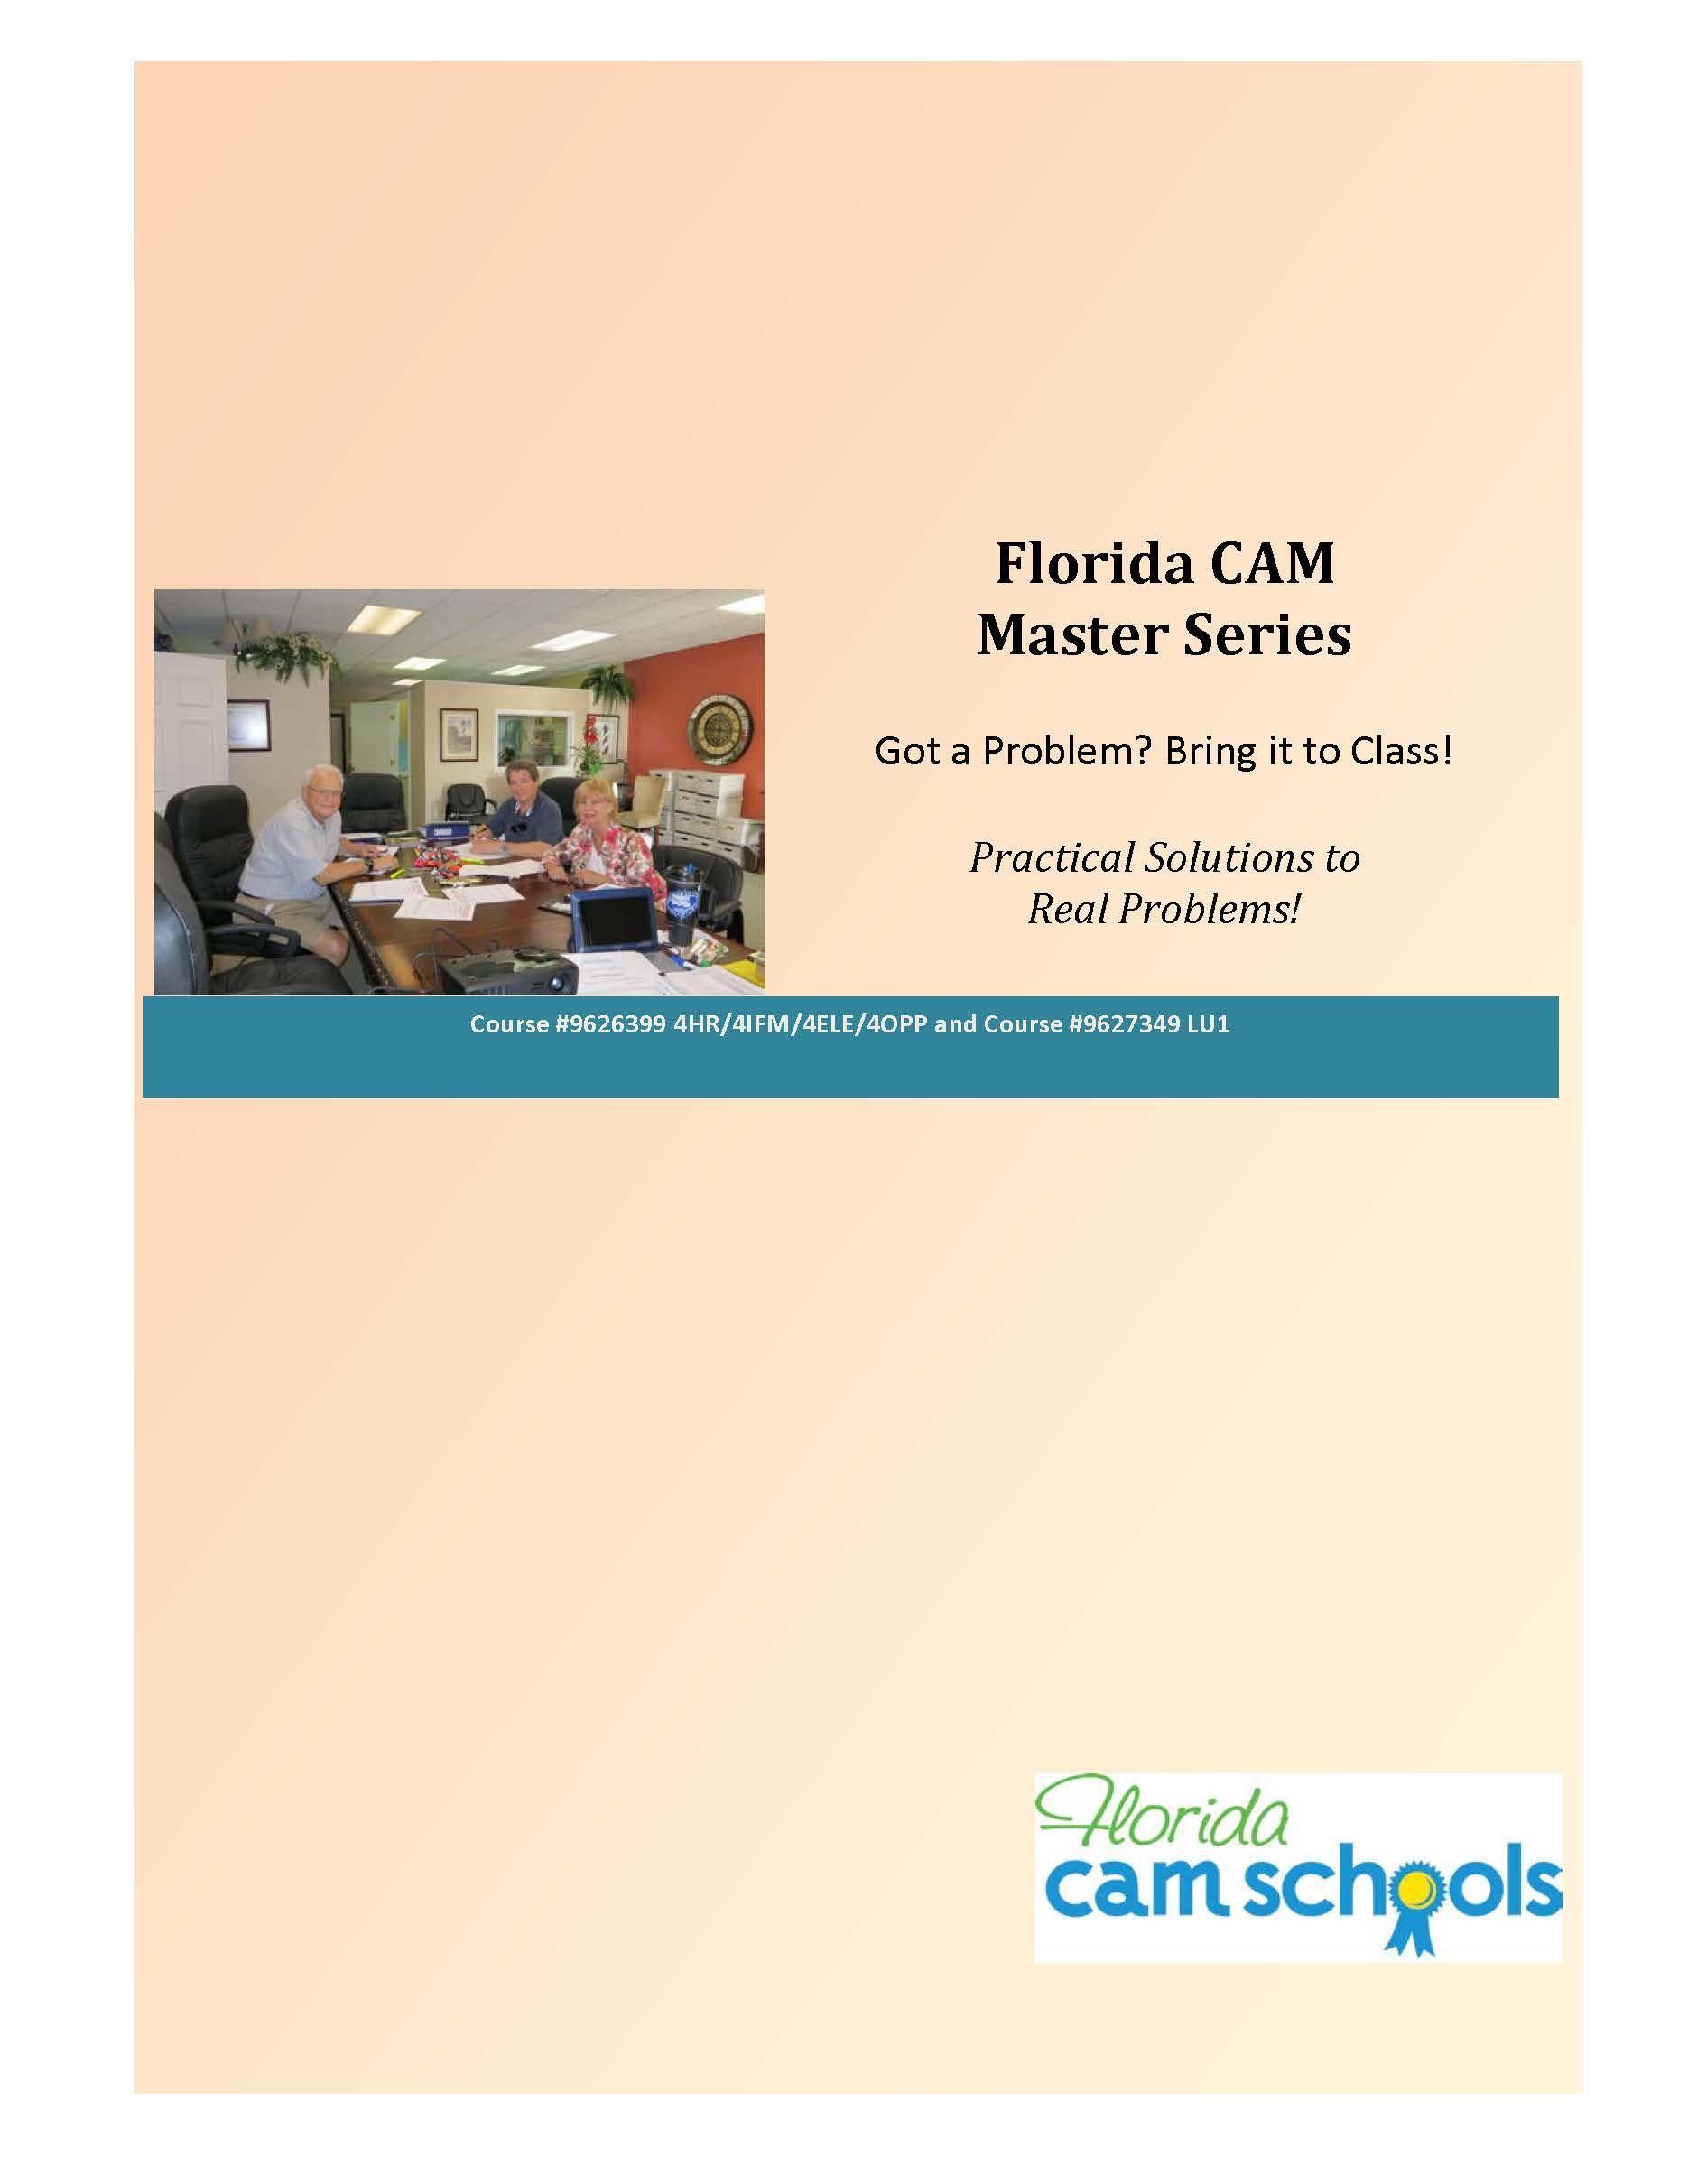 Florida CAM Master Series (manual)